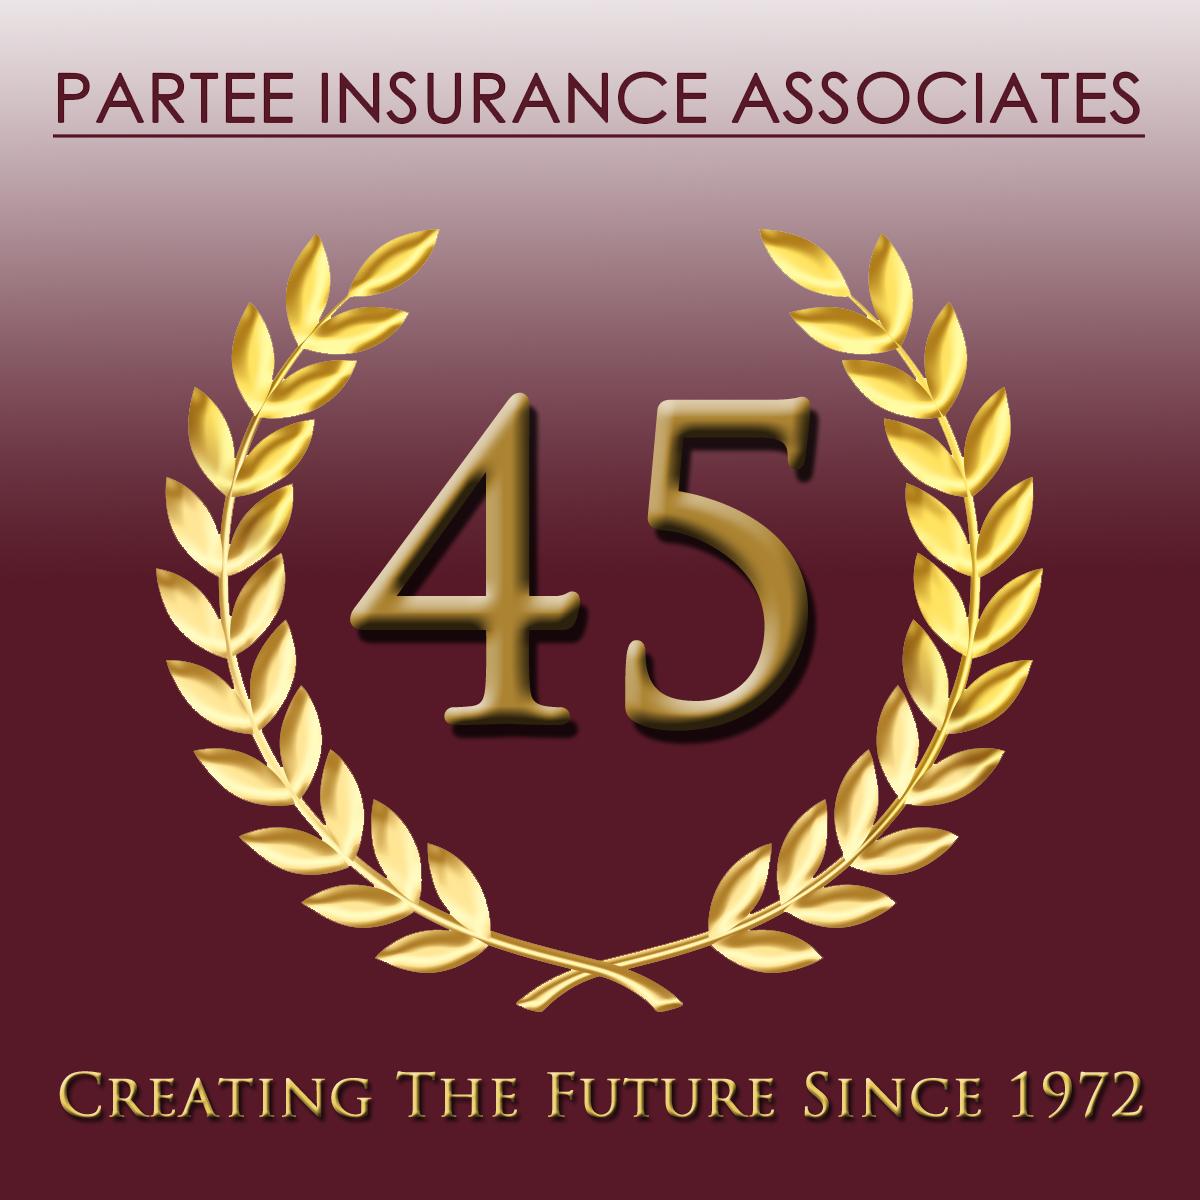 45th_Anniversary_Logo_02 copy.png